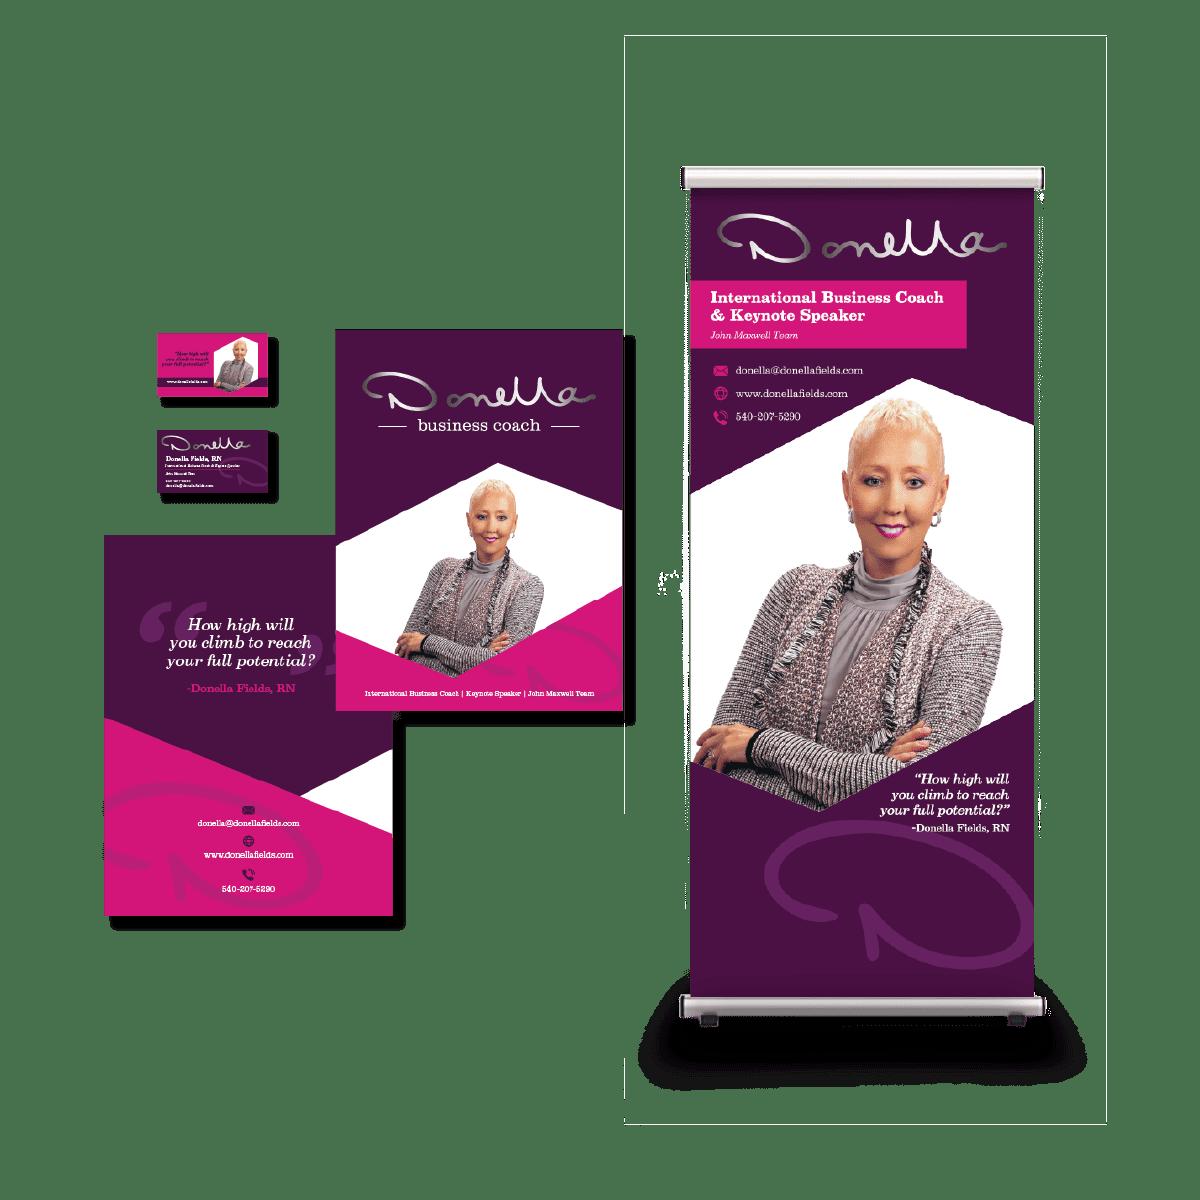 graphic design business coach